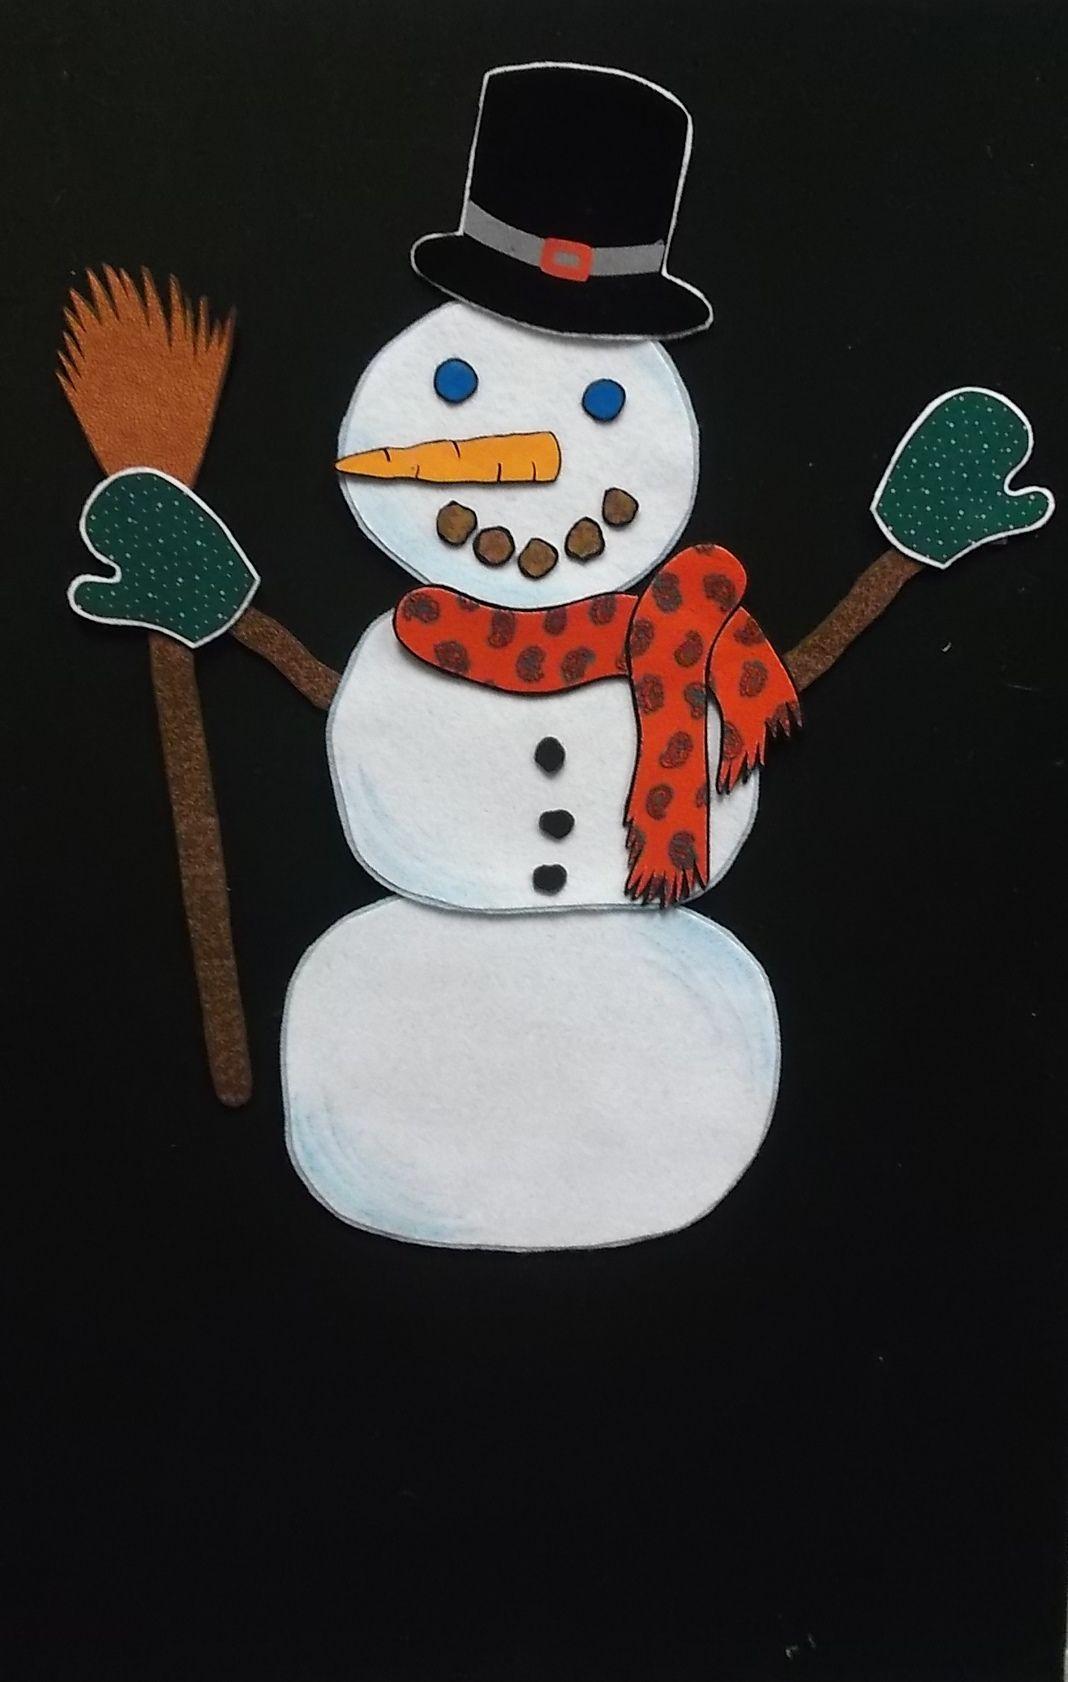 Snowman From One Snowy Day By Jeffrey Scherer